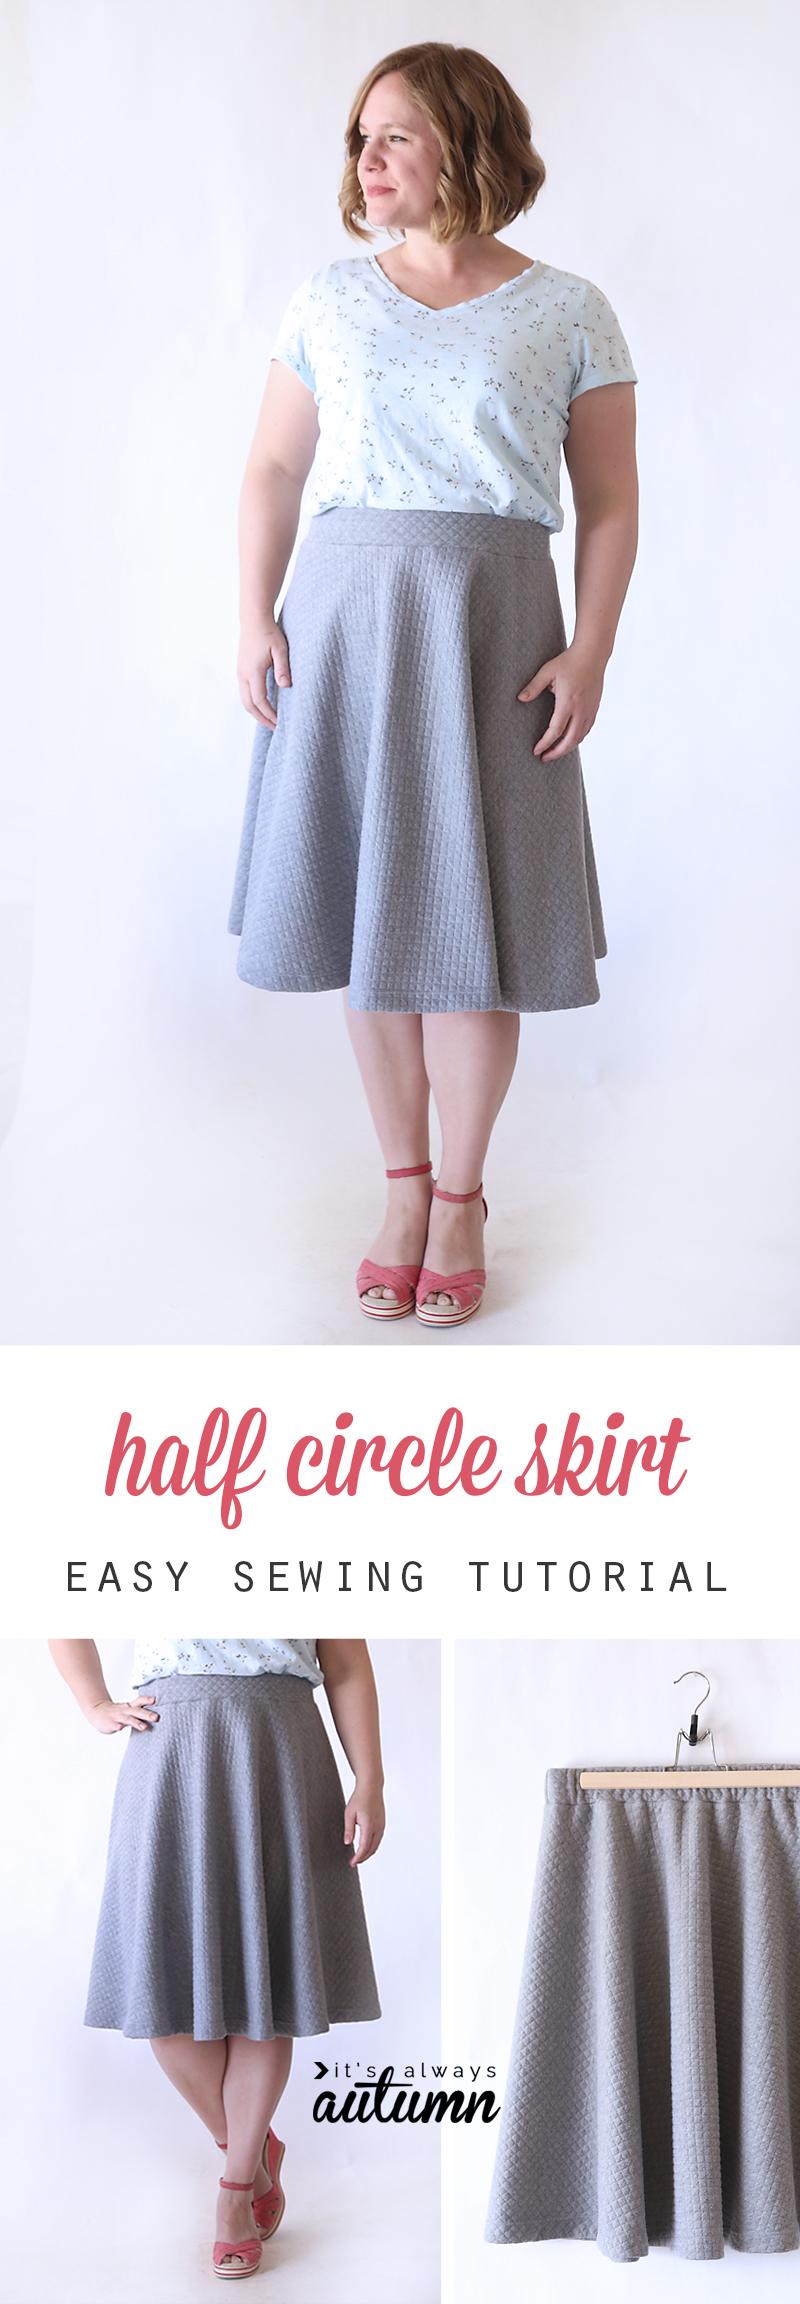 A woman wearing a half circle skirt